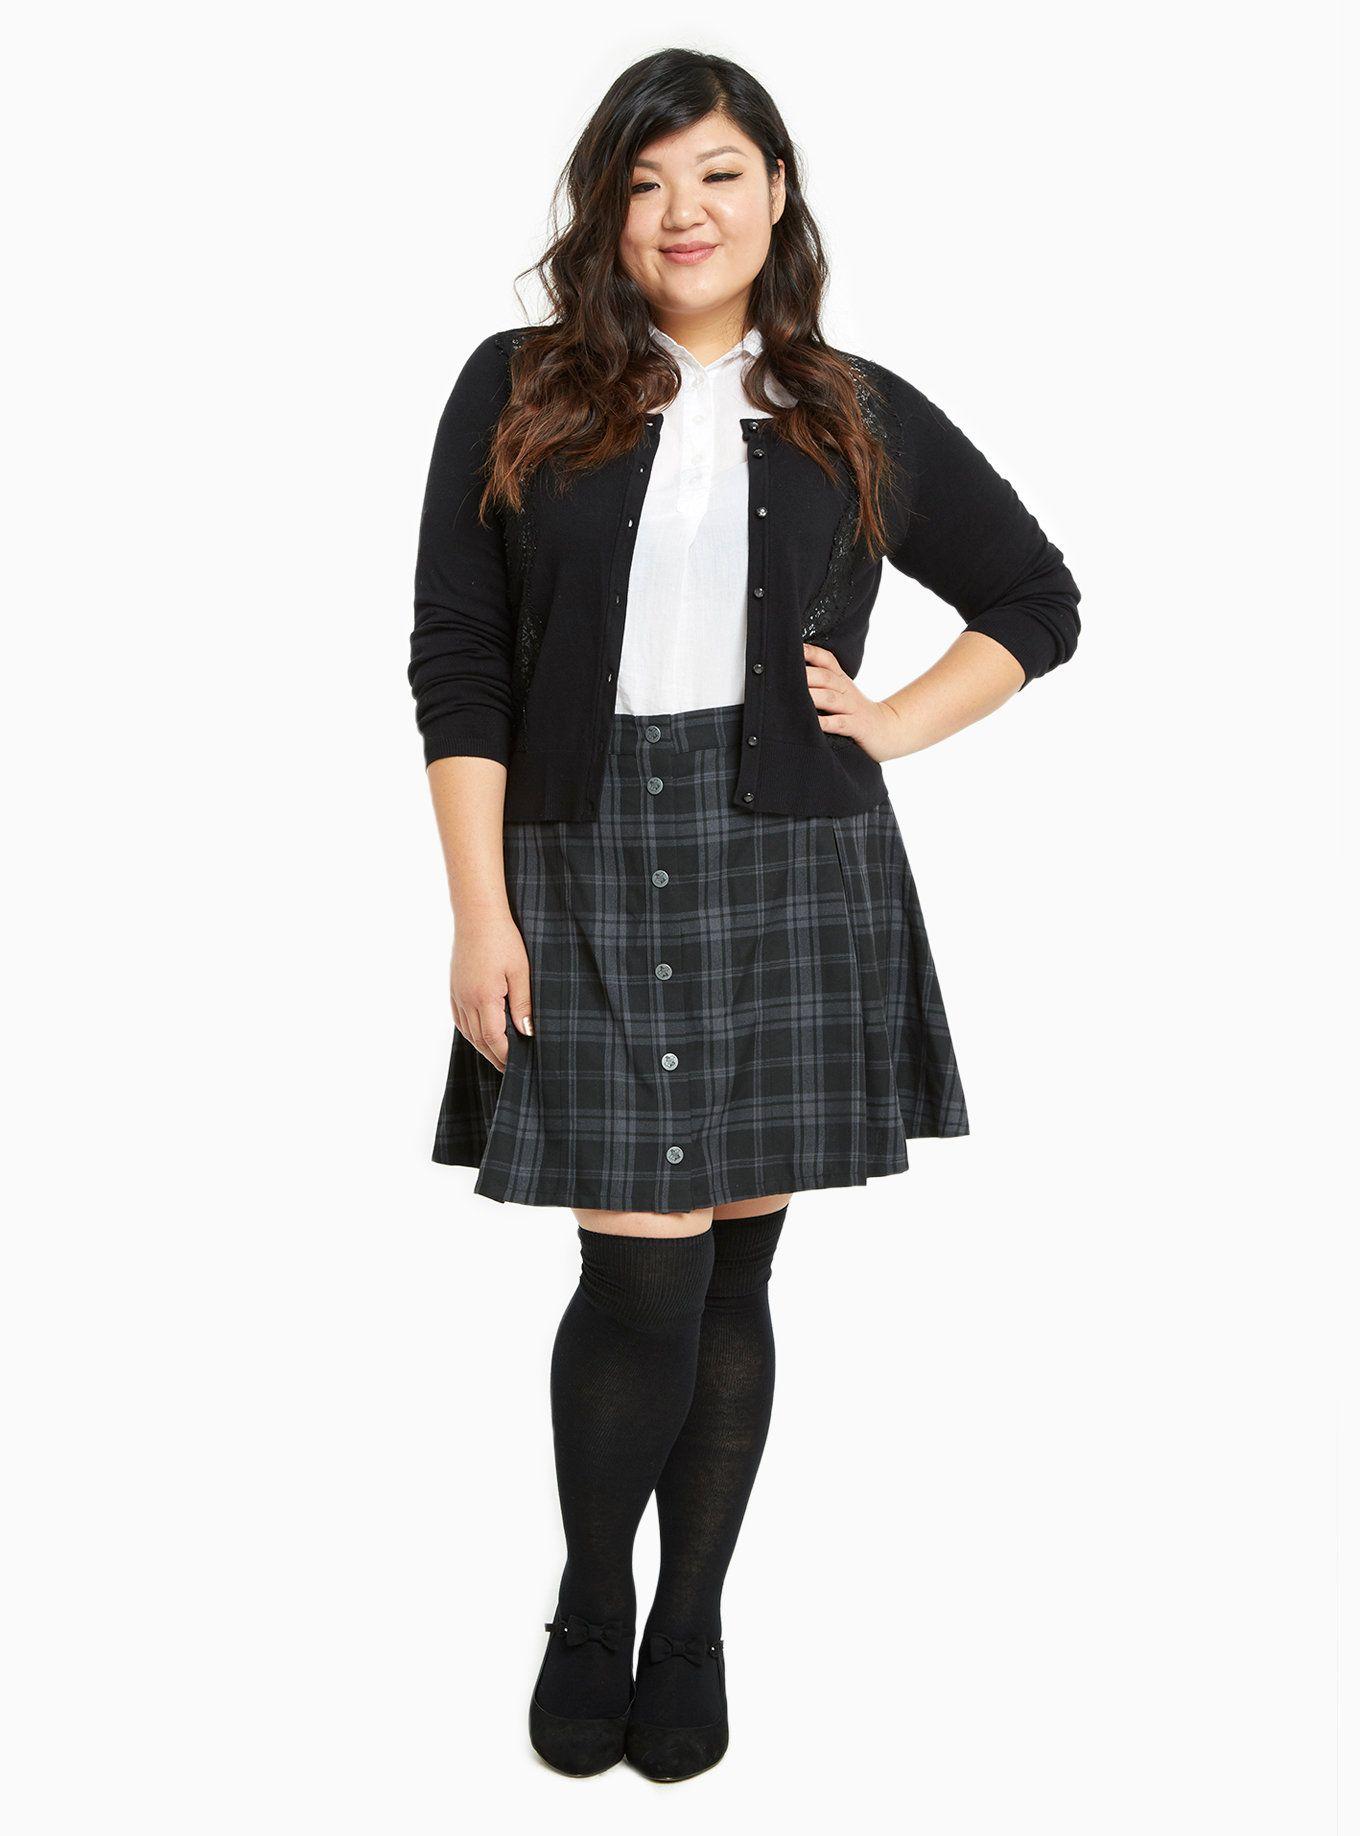 School party porn girl